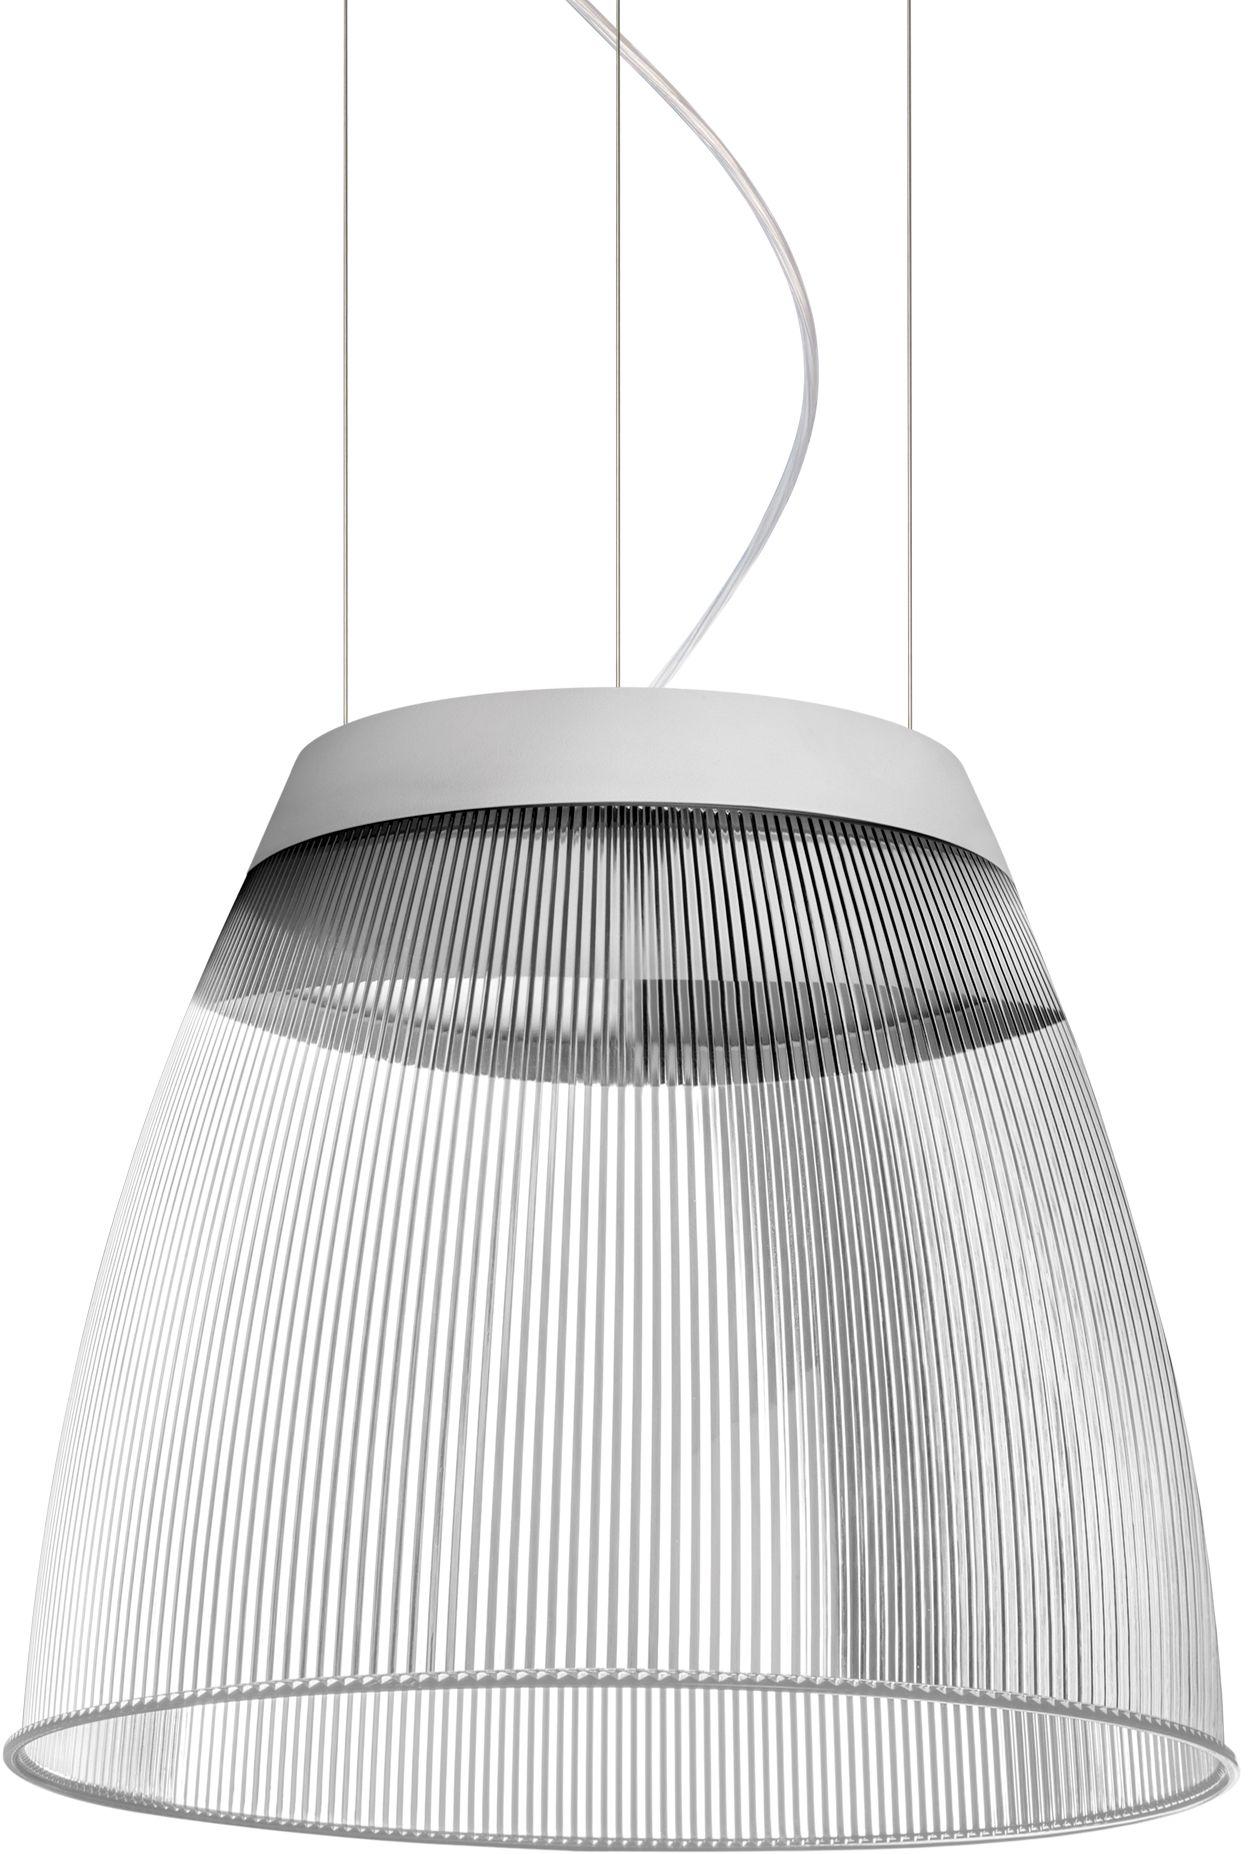 la de Light Salt Techo LED Lámpara de marca Arkos modelo DWEH29IY